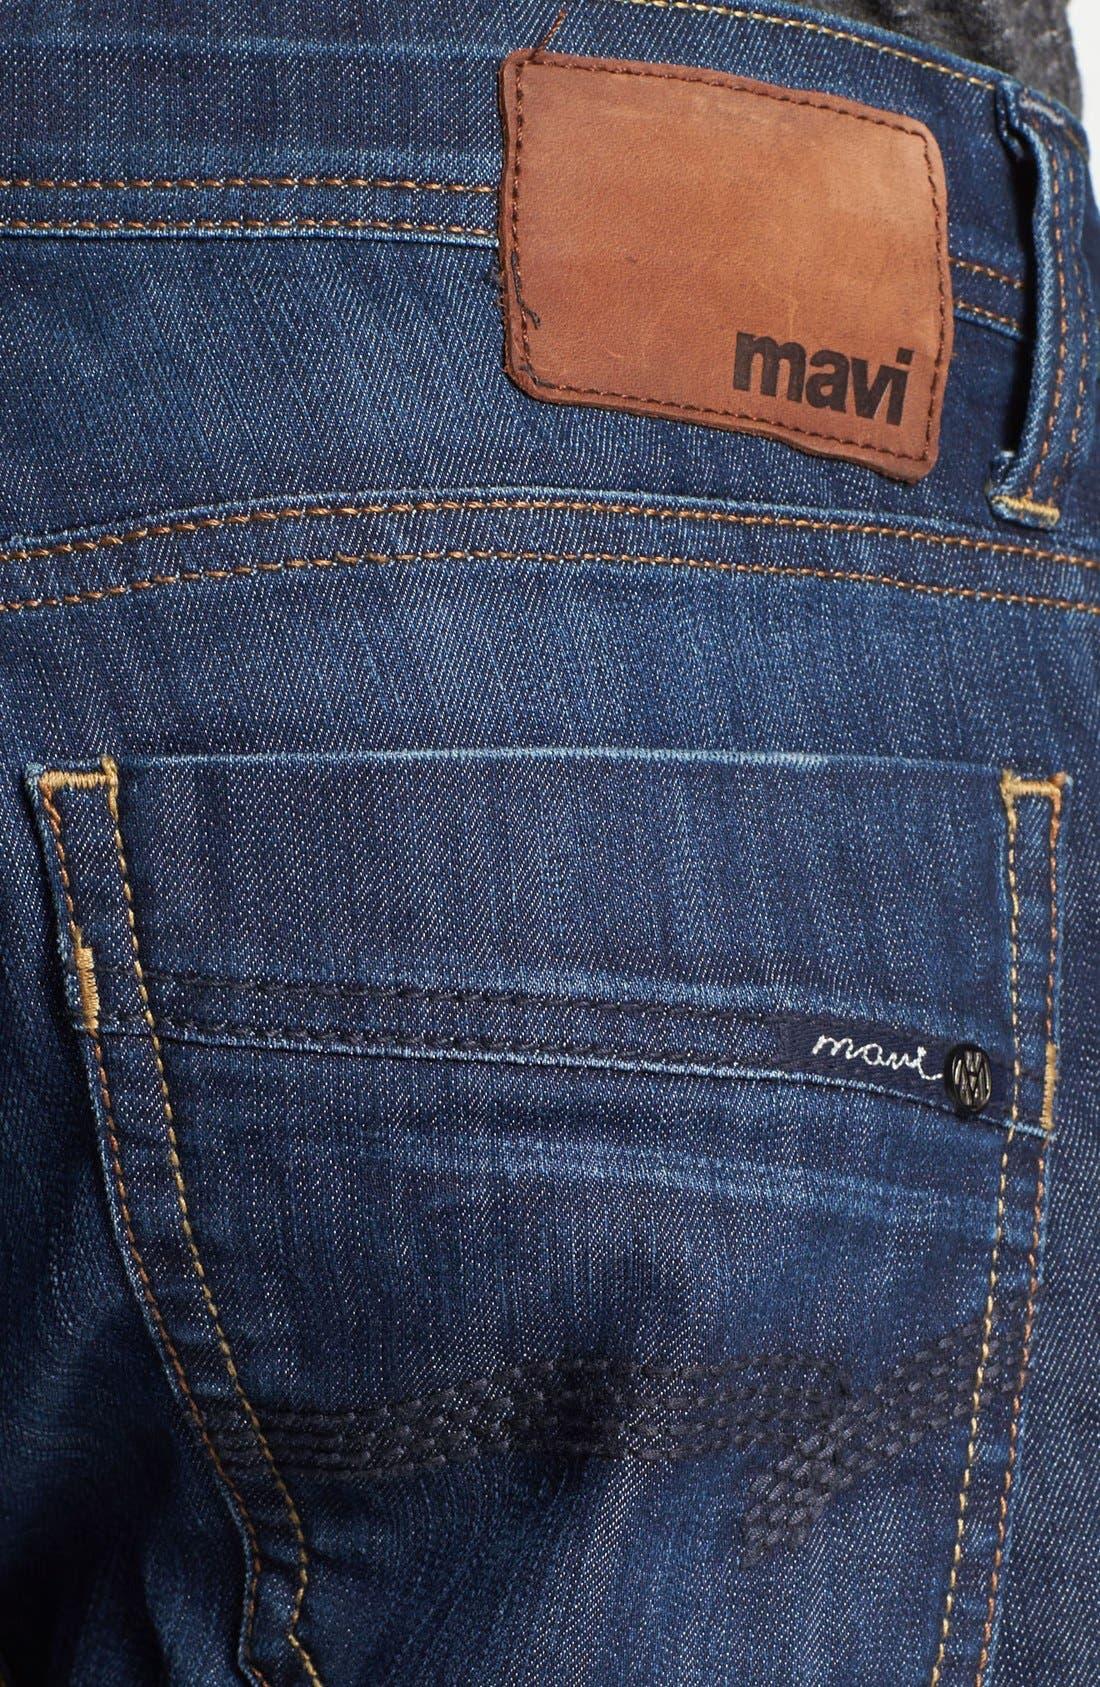 Zach Straight Leg Jeans,                             Alternate thumbnail 4, color,                             Dark Maui